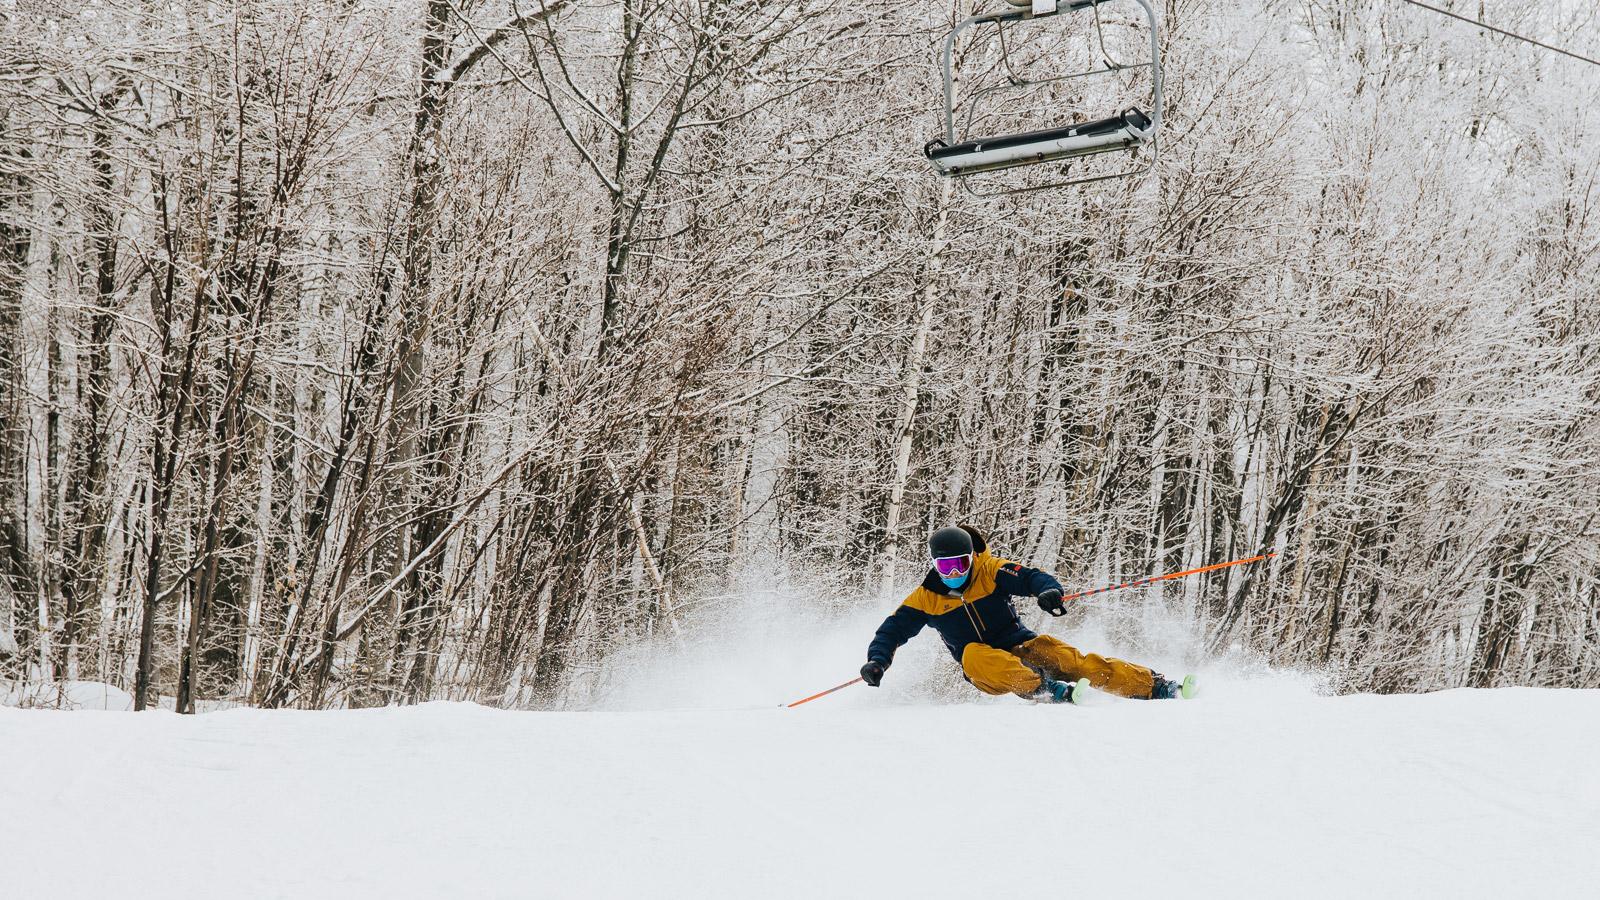 skiing, ski, elan ripstick 96, the ski monster, Sunapee